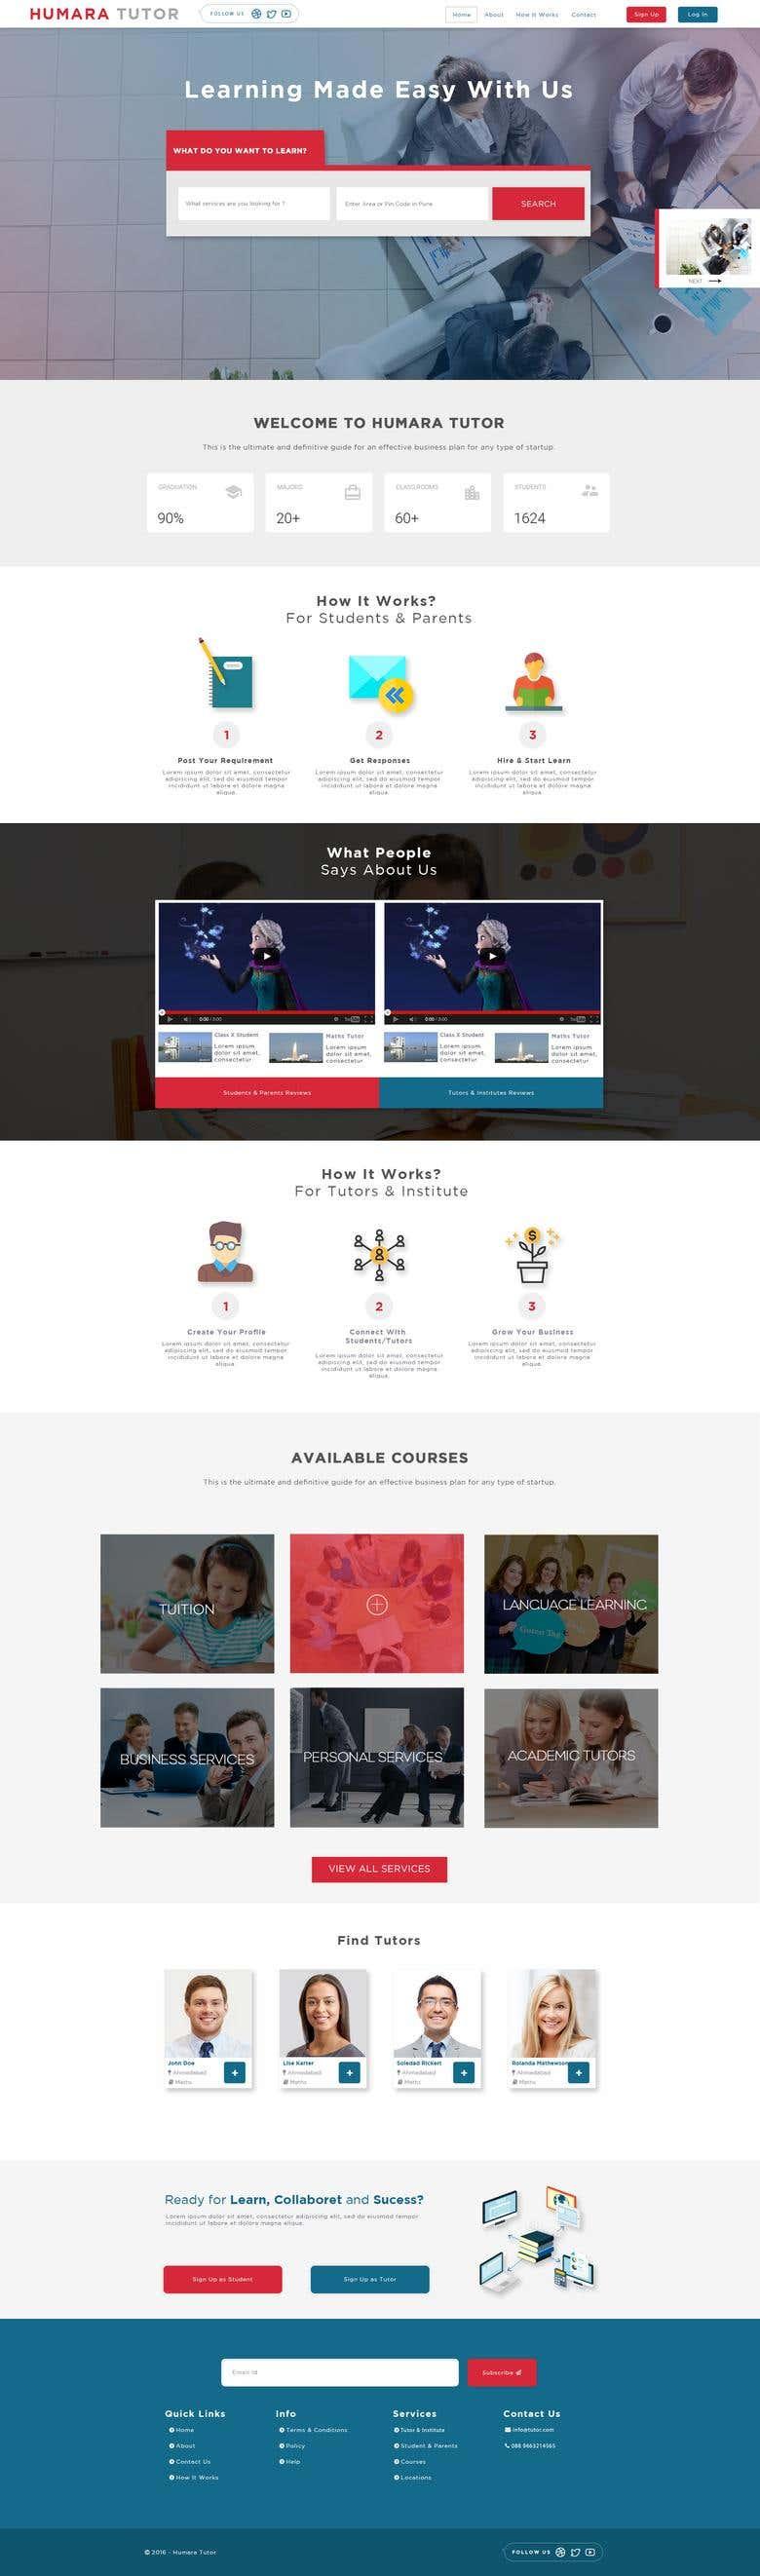 Hamara Tutor Responsive Web Design Core Php Development Freelancer